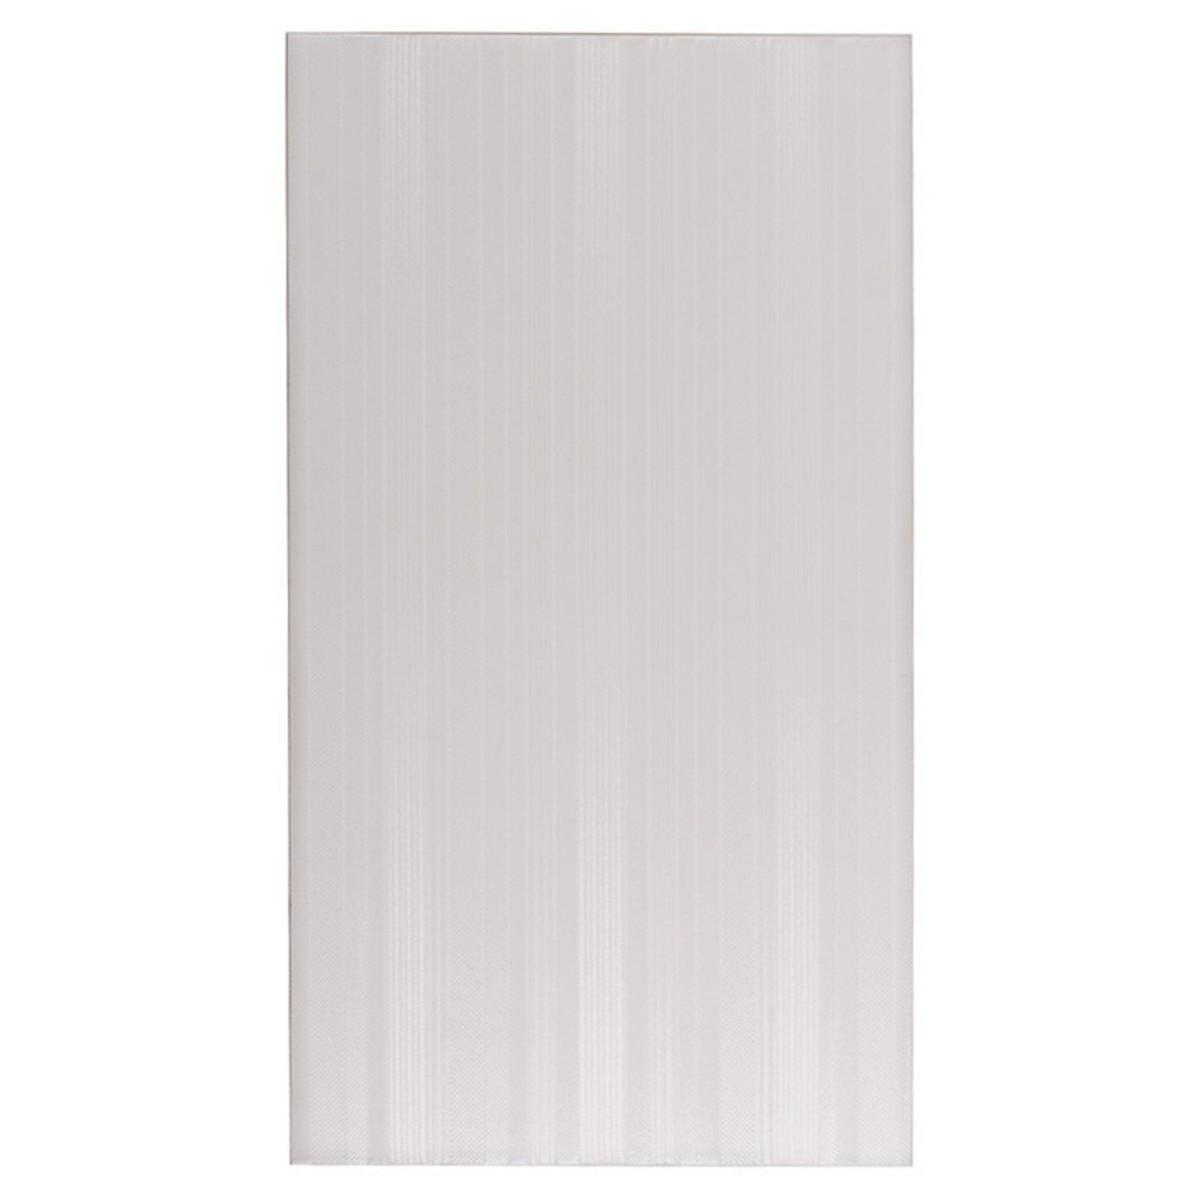 Плитка настенная Бьюти Сноу Лайн 25х45 см 1.46 м2 цвет белый